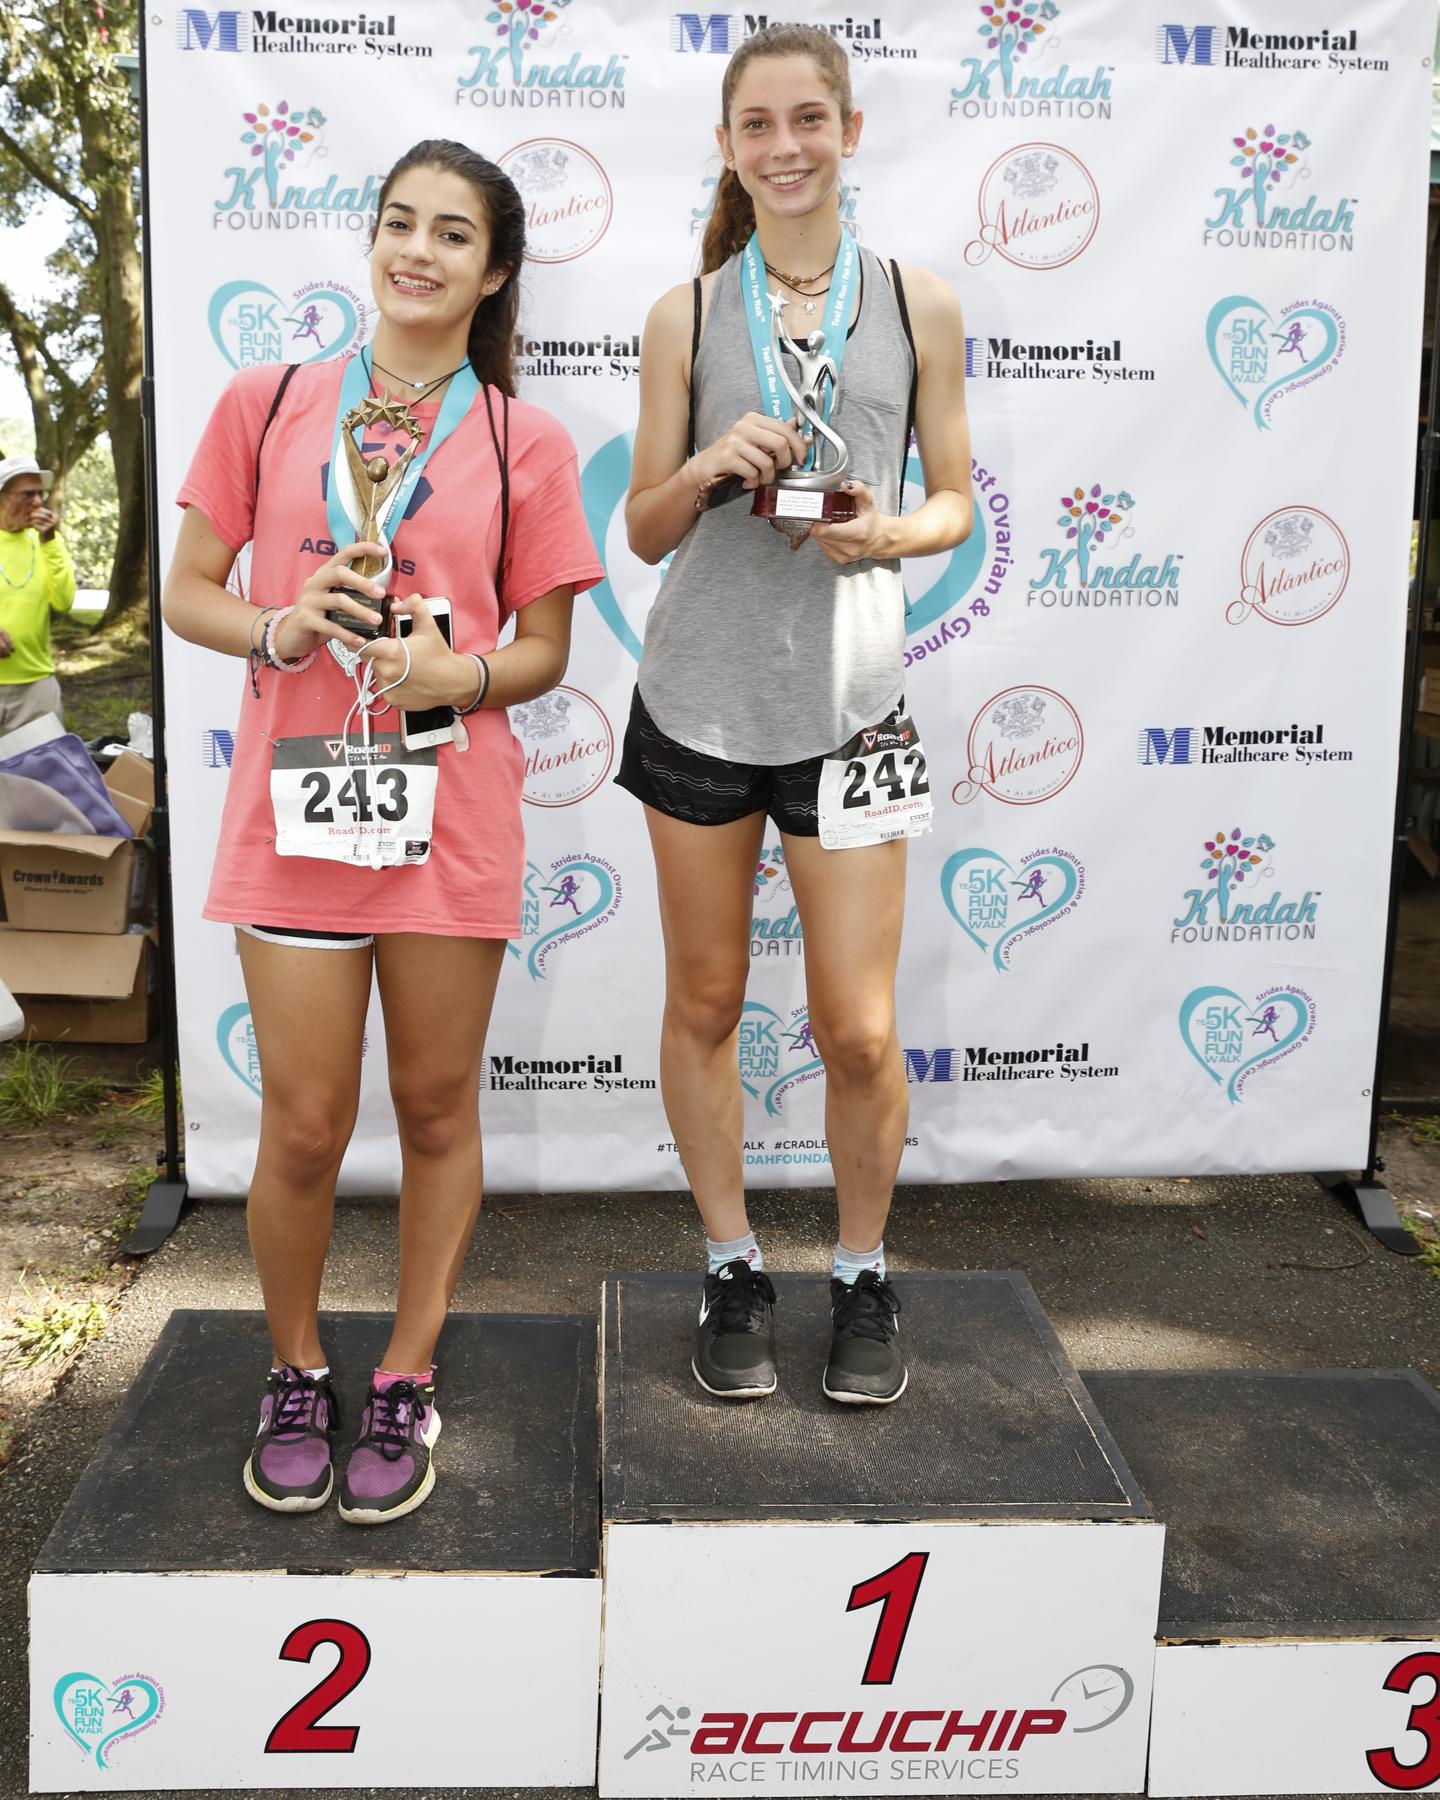 KF 0798 - Florida Teal 5K Run/ Fun Walk 2016